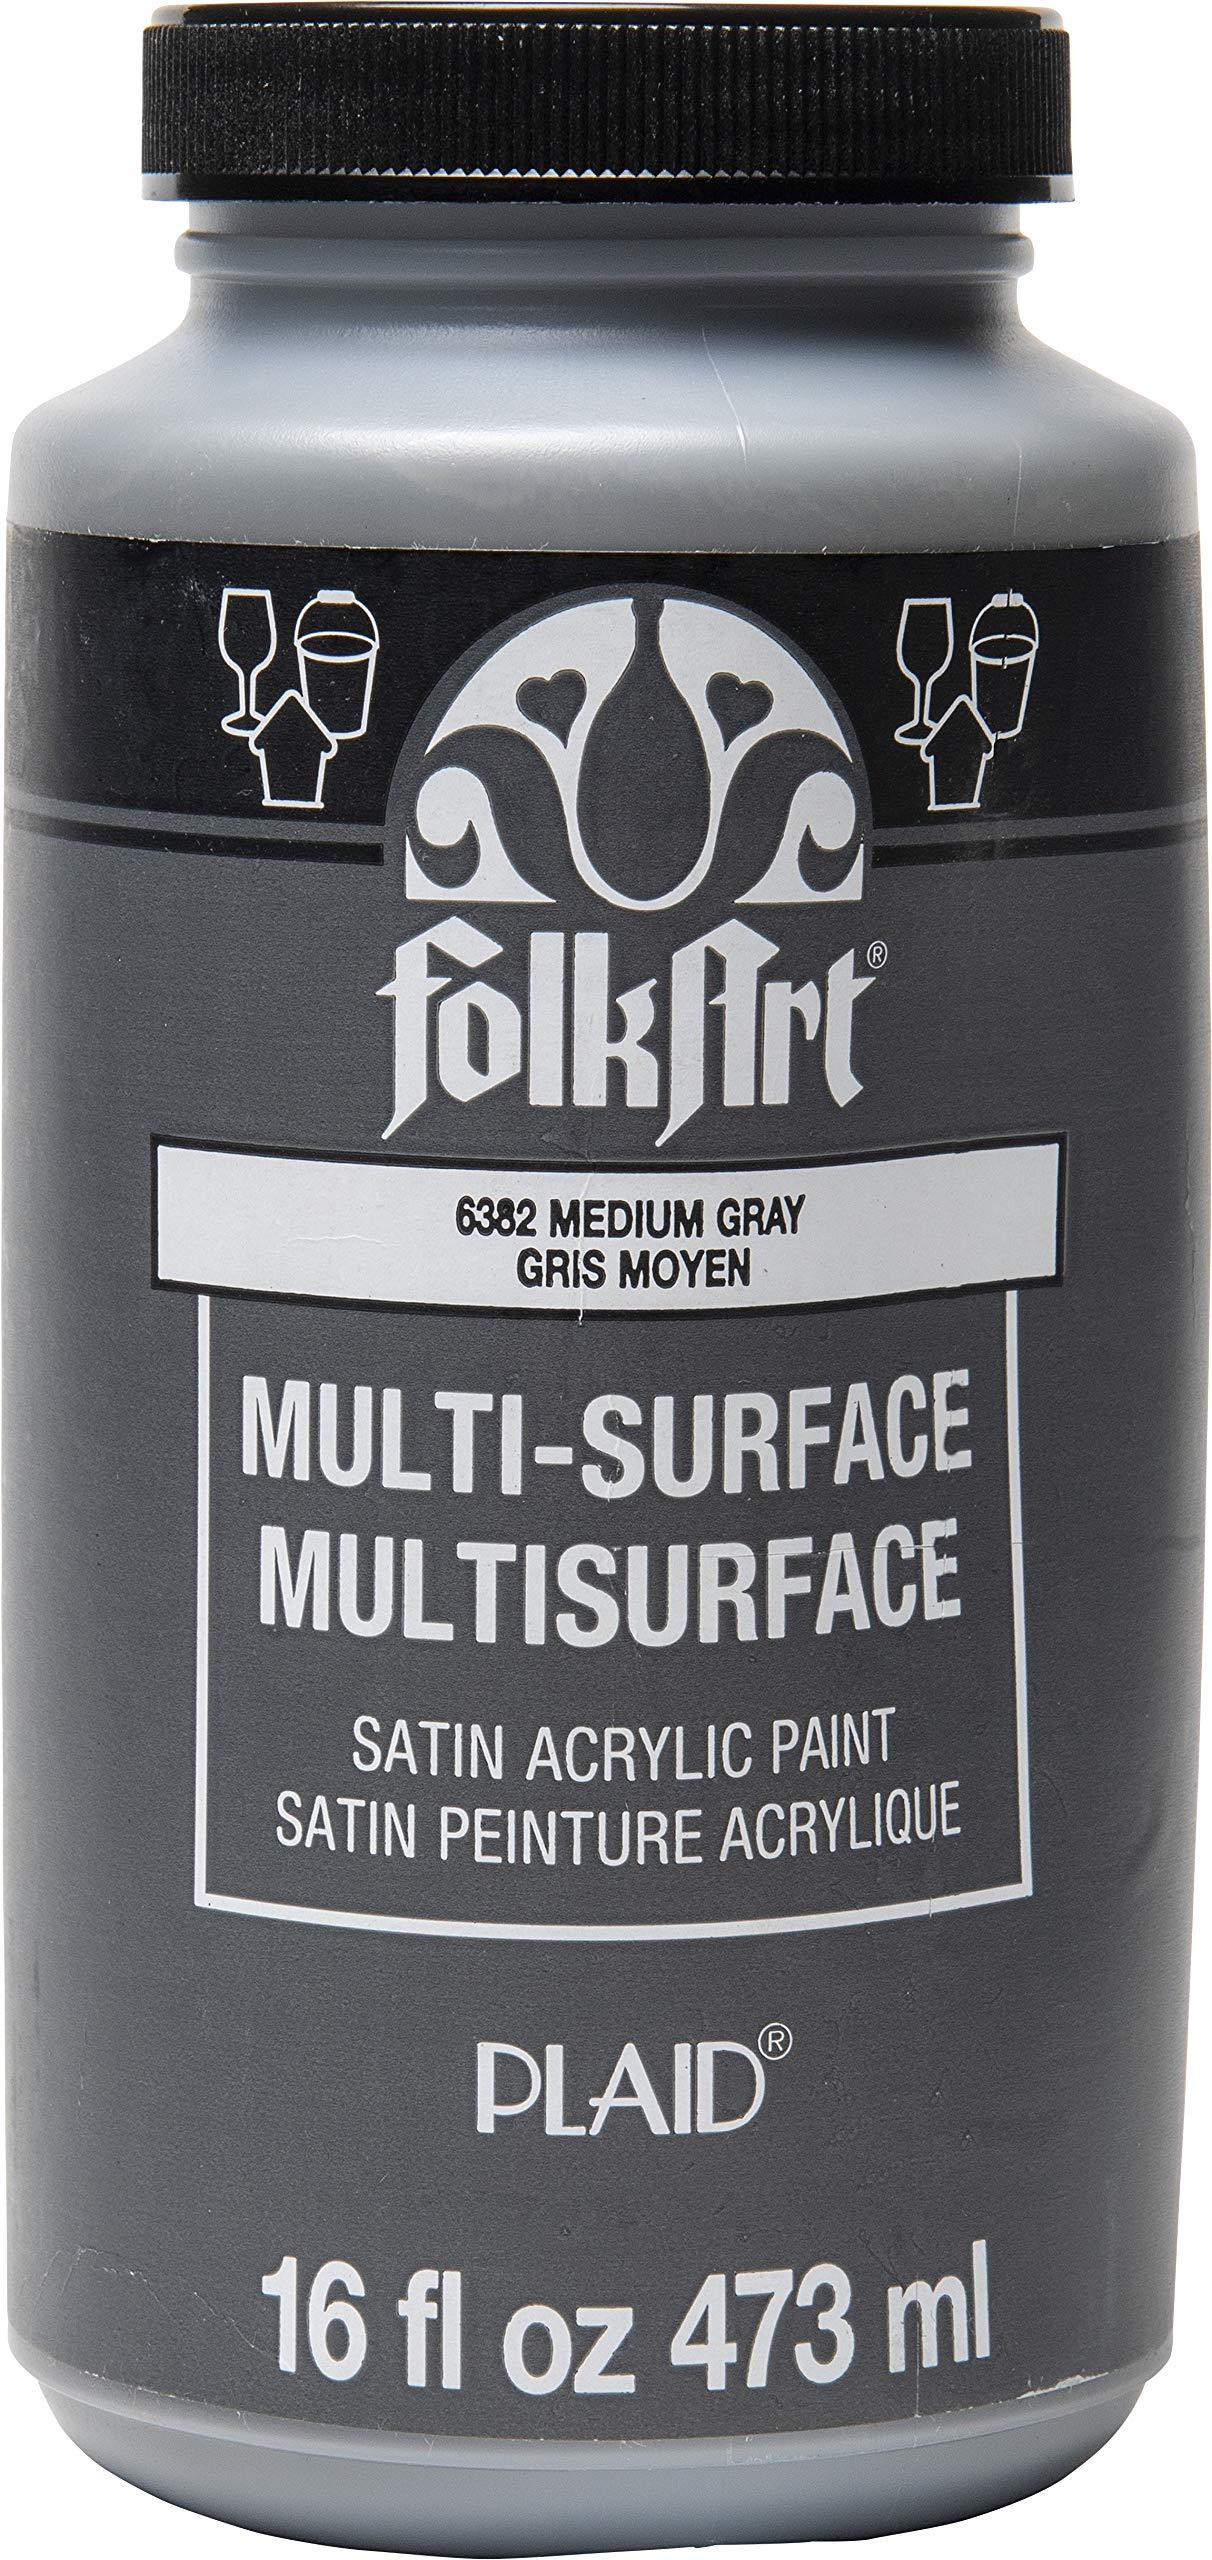 FolkArt 6382 Multi-Surface Satin Acrylic Paint in Assorted Colors, 16 oz, Medium Gray 16 Fl Oz